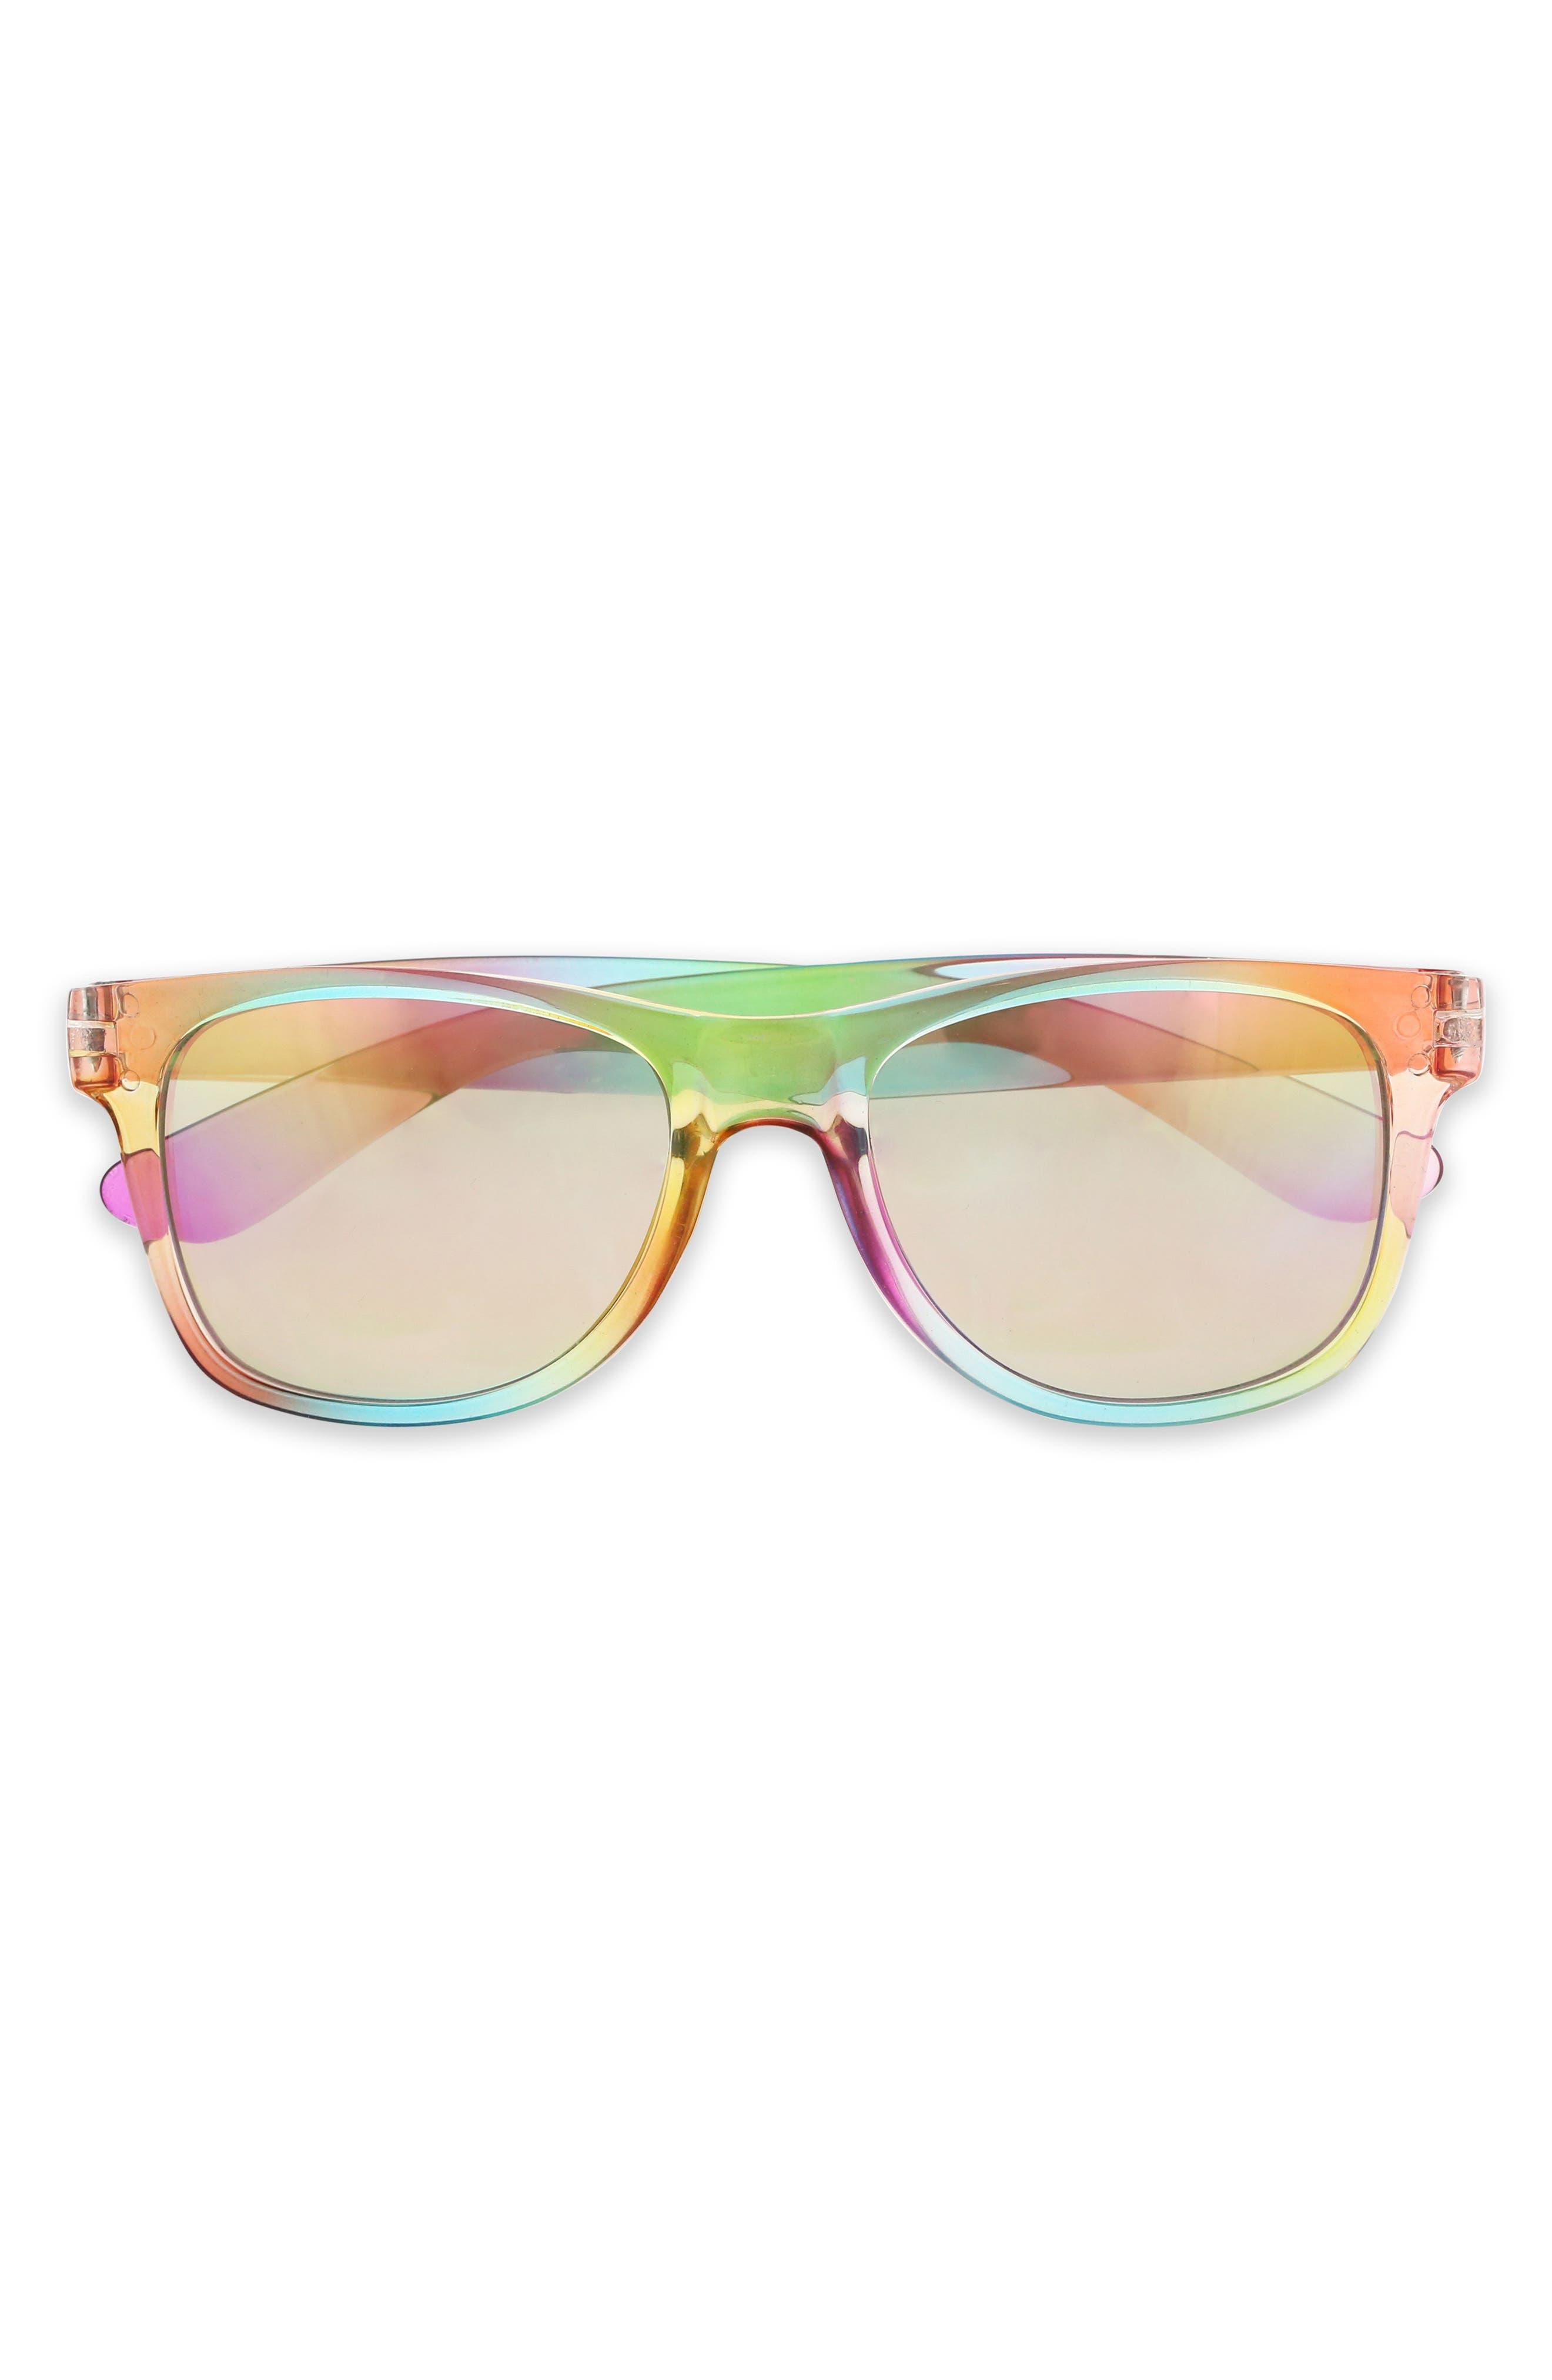 60mm Mirrored Sunglasses,                         Main,                         color, 305